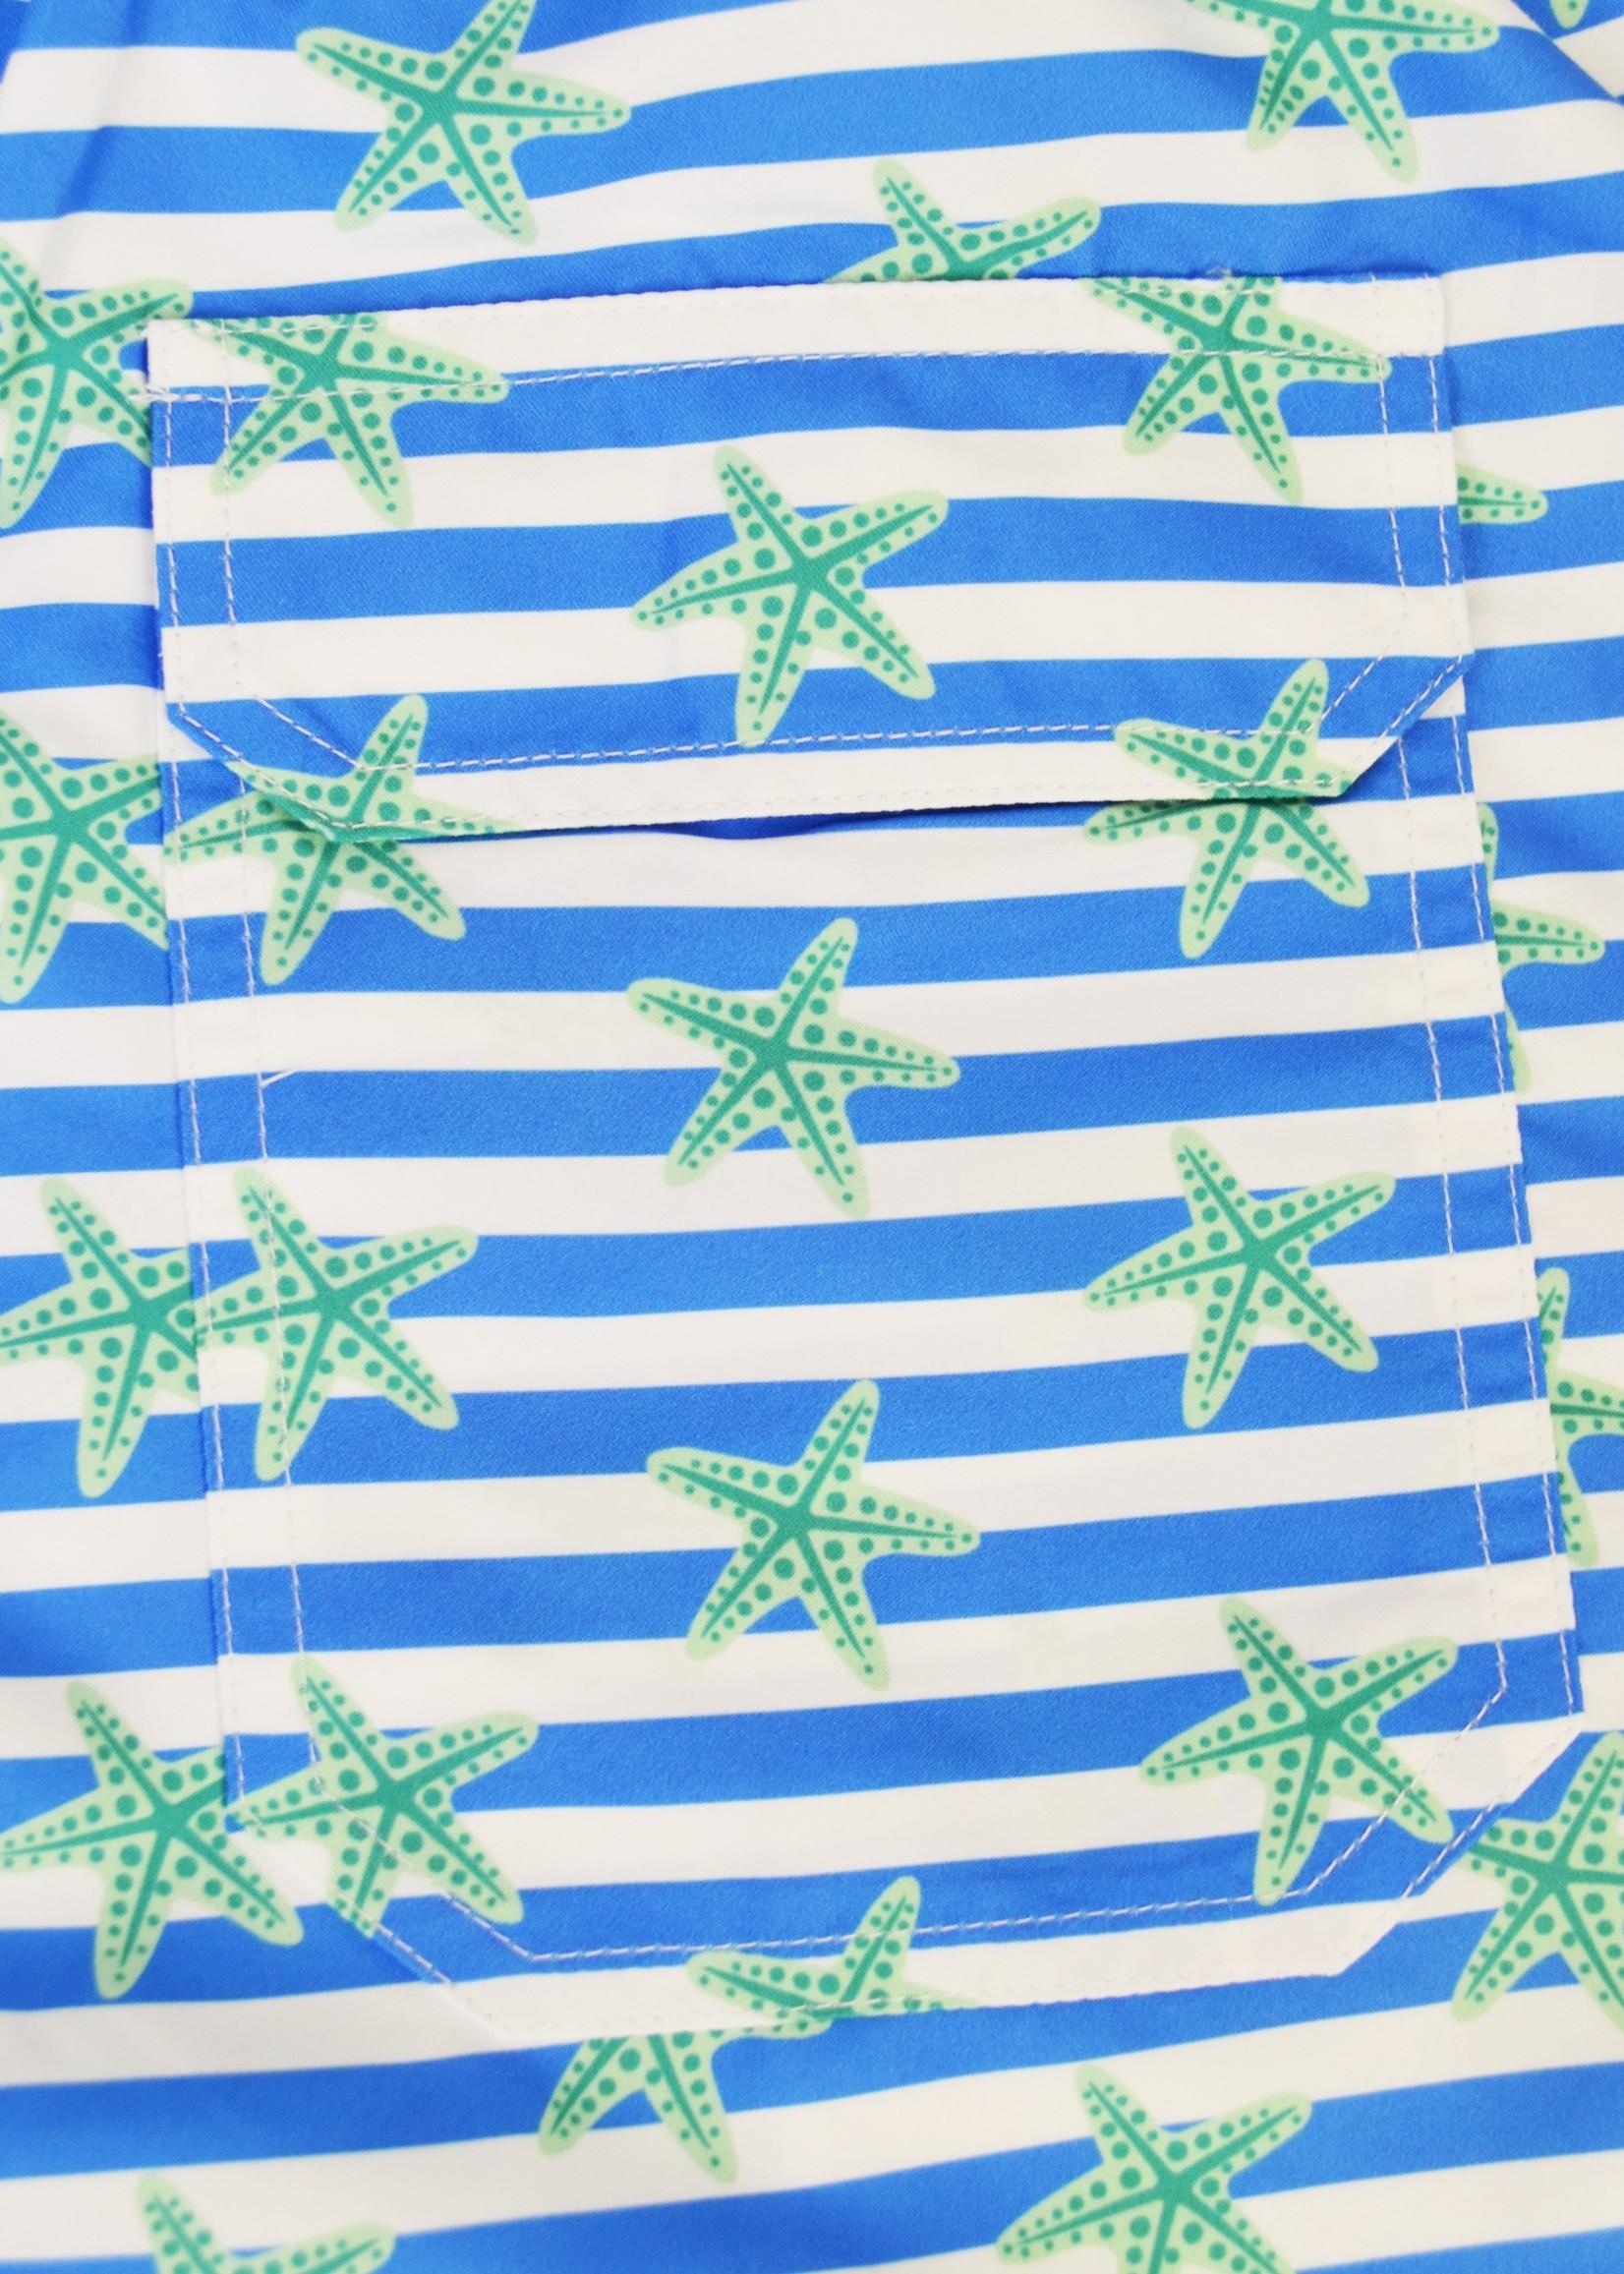 bald head blues Ultramarine Starfish Swim Trunks